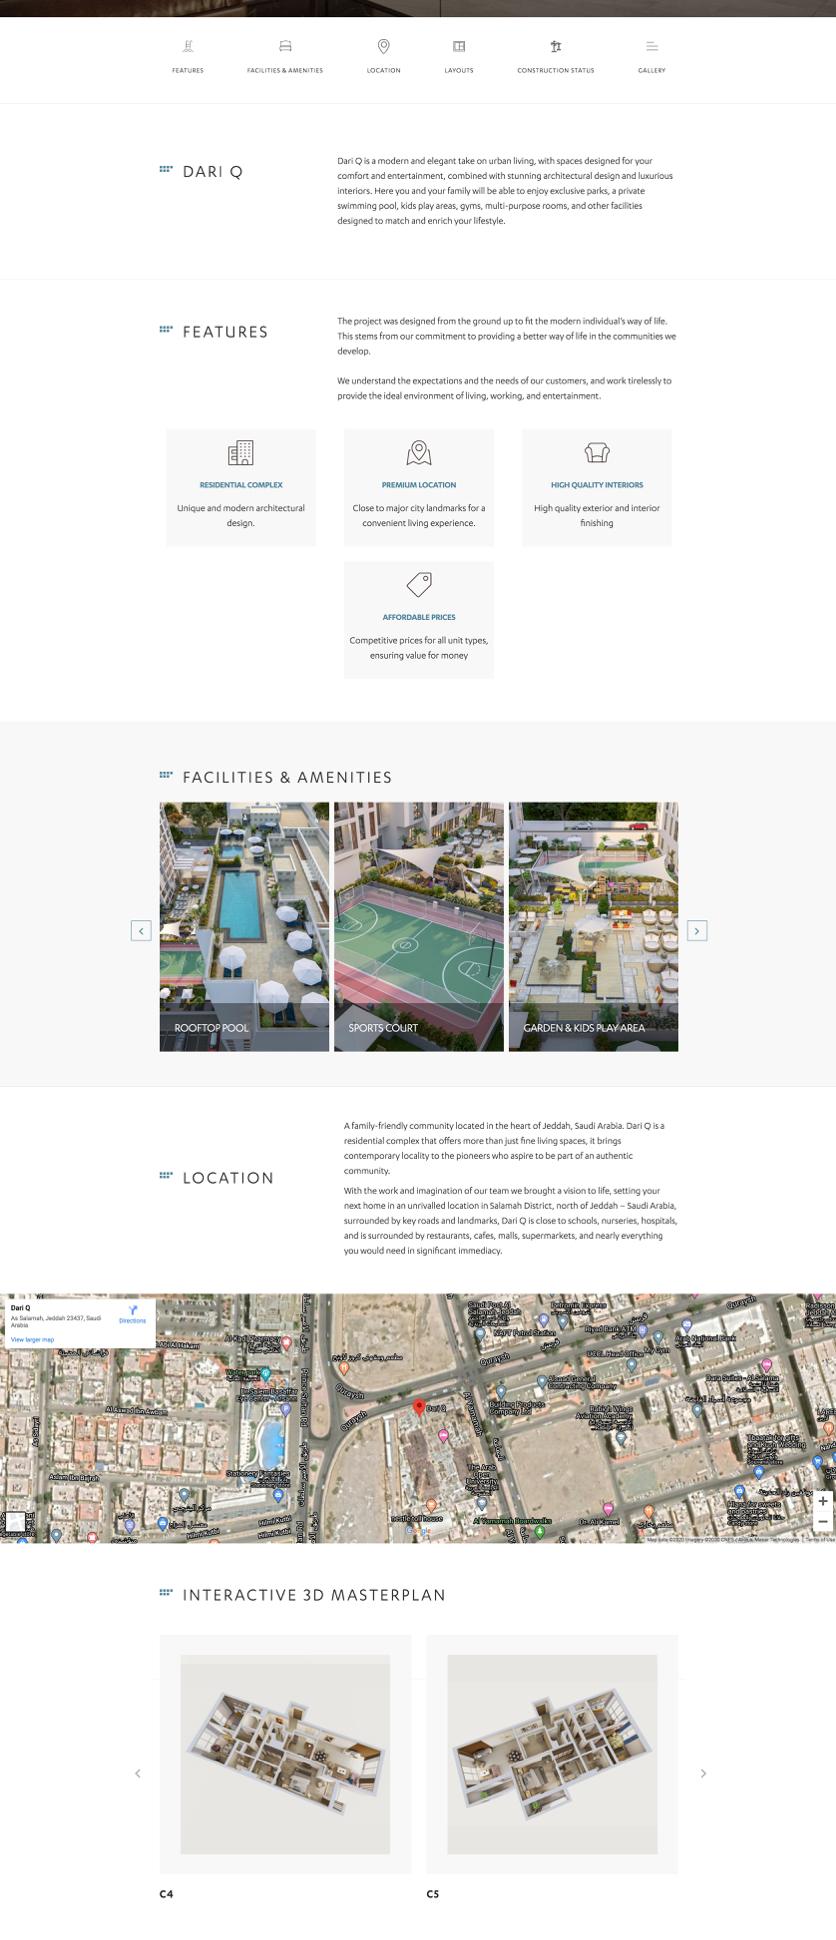 Web Image Gallery 2-Jul-11-2020-05-40-26-62-PM